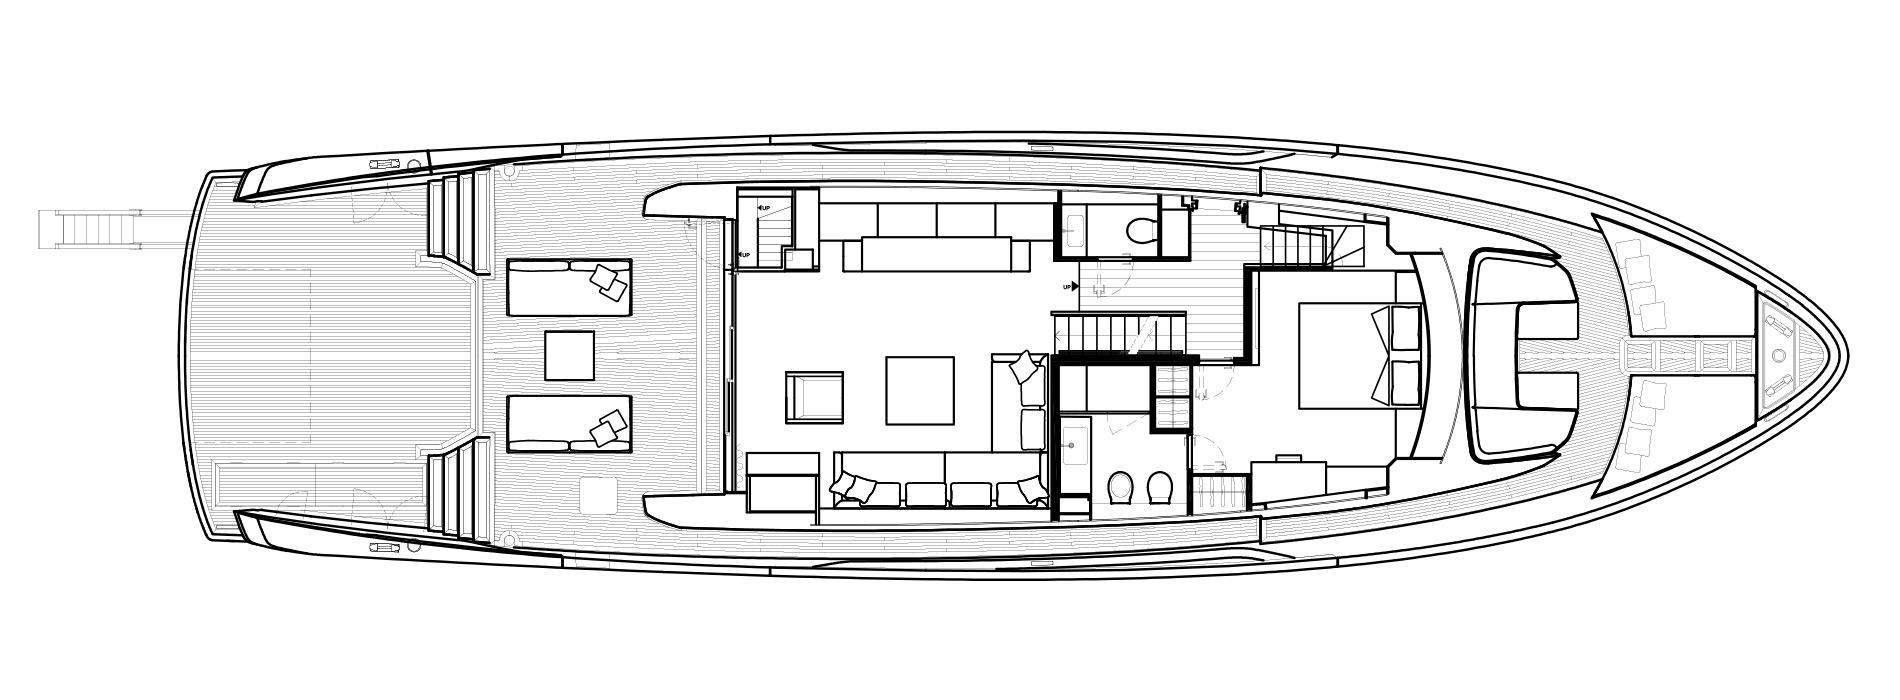 Sanlorenzo Yachts SX88 Main deck Version C